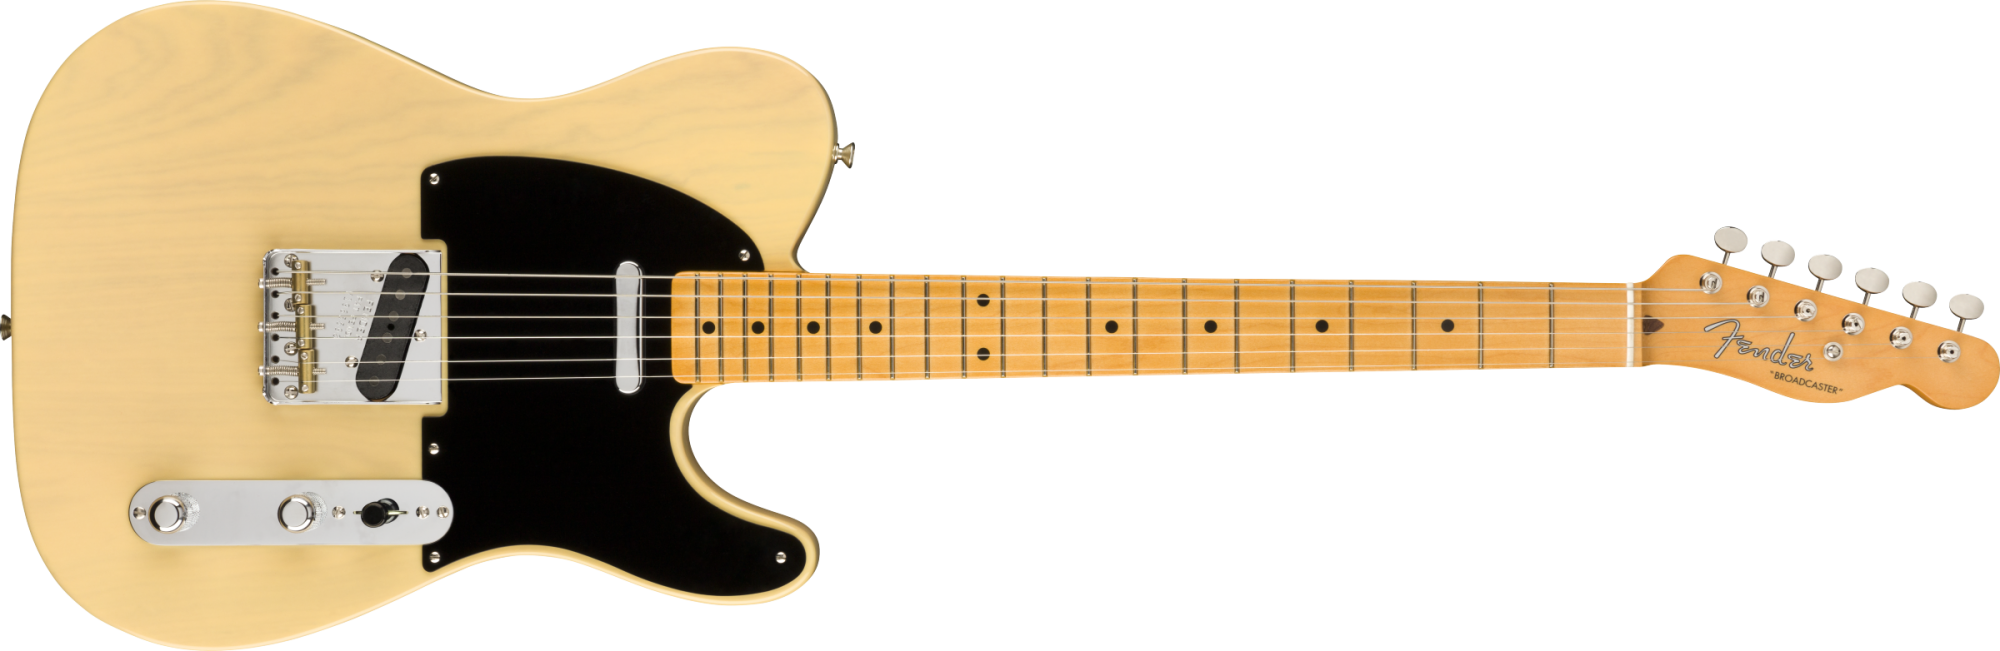 Fender 70th Anniversary Broadcaster, Maple Fingerboard, Blackguard Blonde- 7. 4 1/2 oz